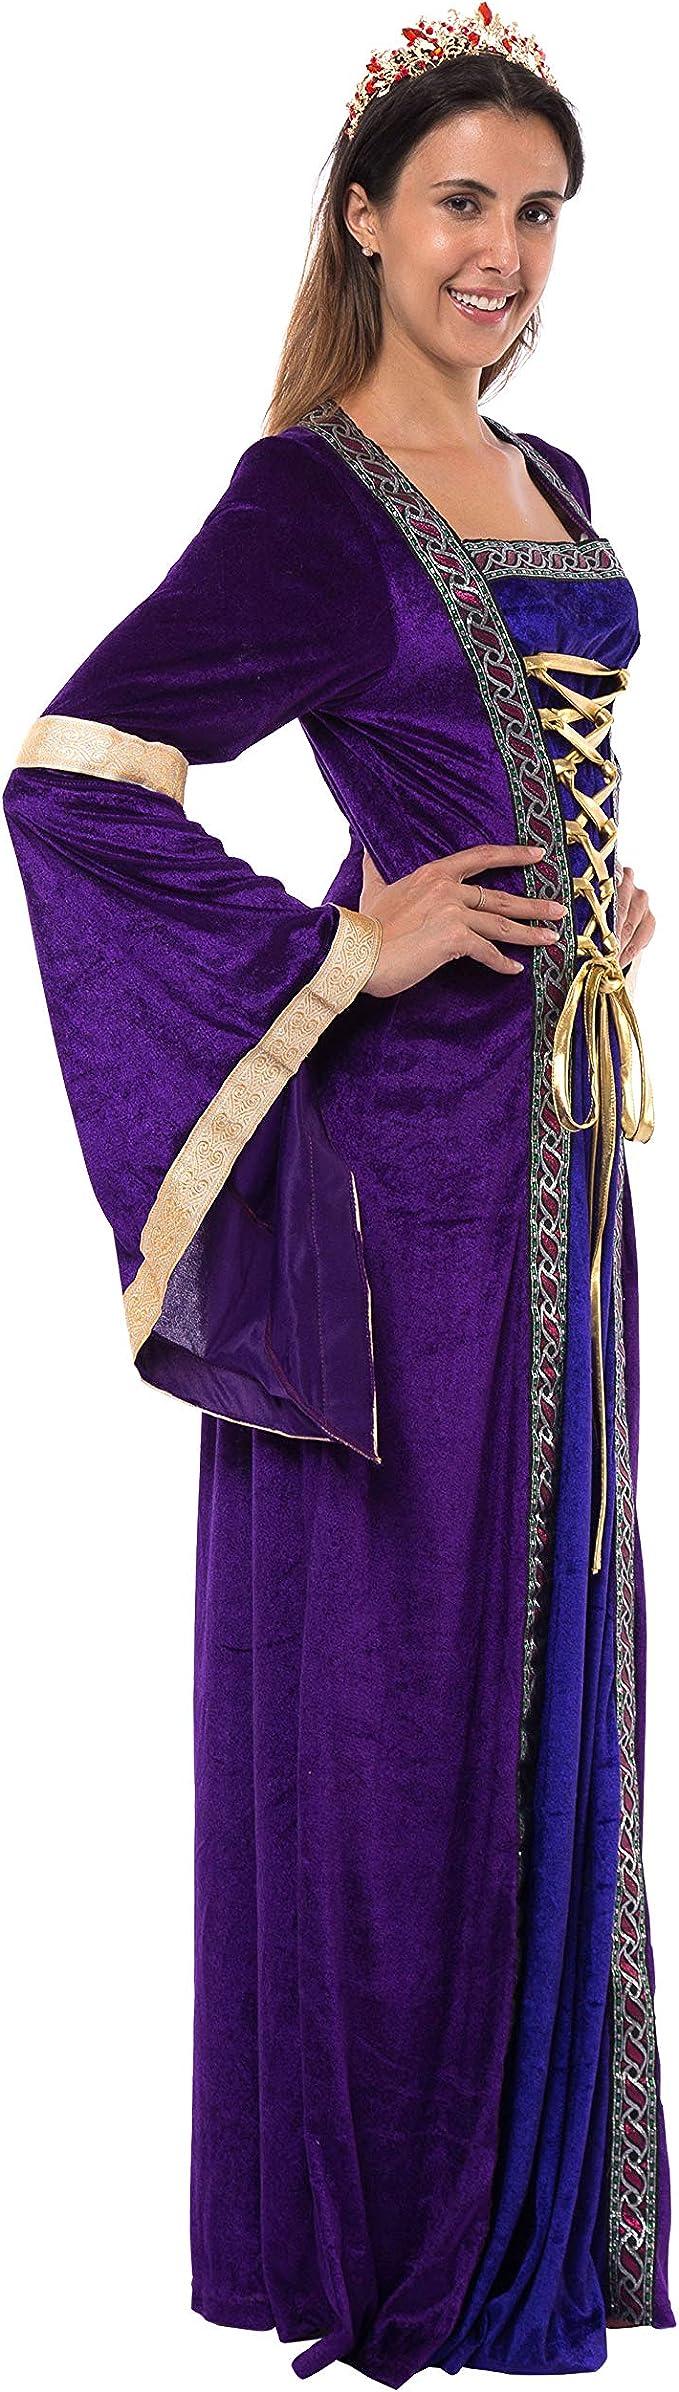 Amazon.com: Spooktacular Creations - Disfraz de princesa ...